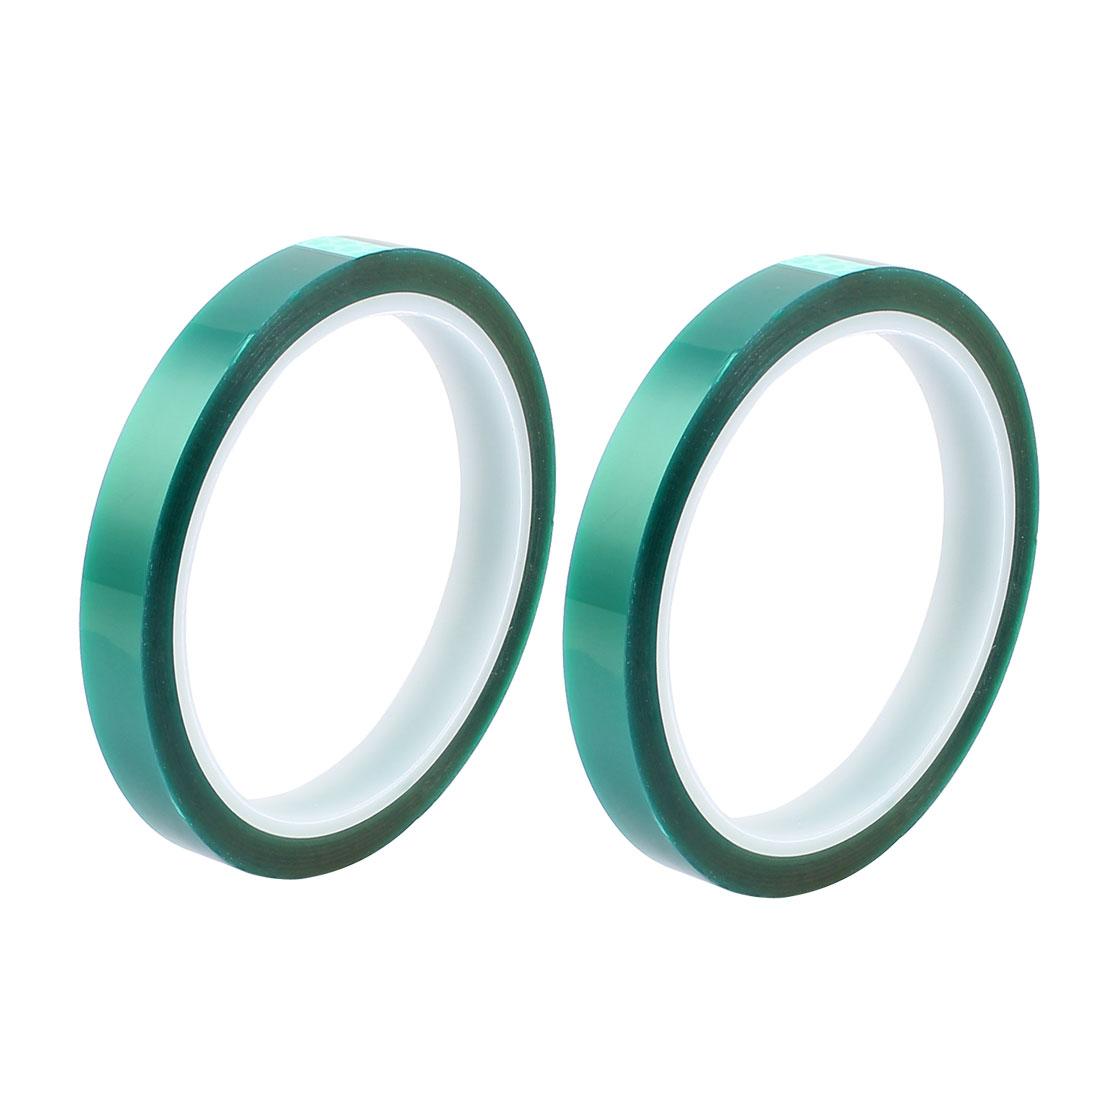 2pcs 10mm Width 33M Long Green PET High Temperature Heat Resistant PCB Solder Tape